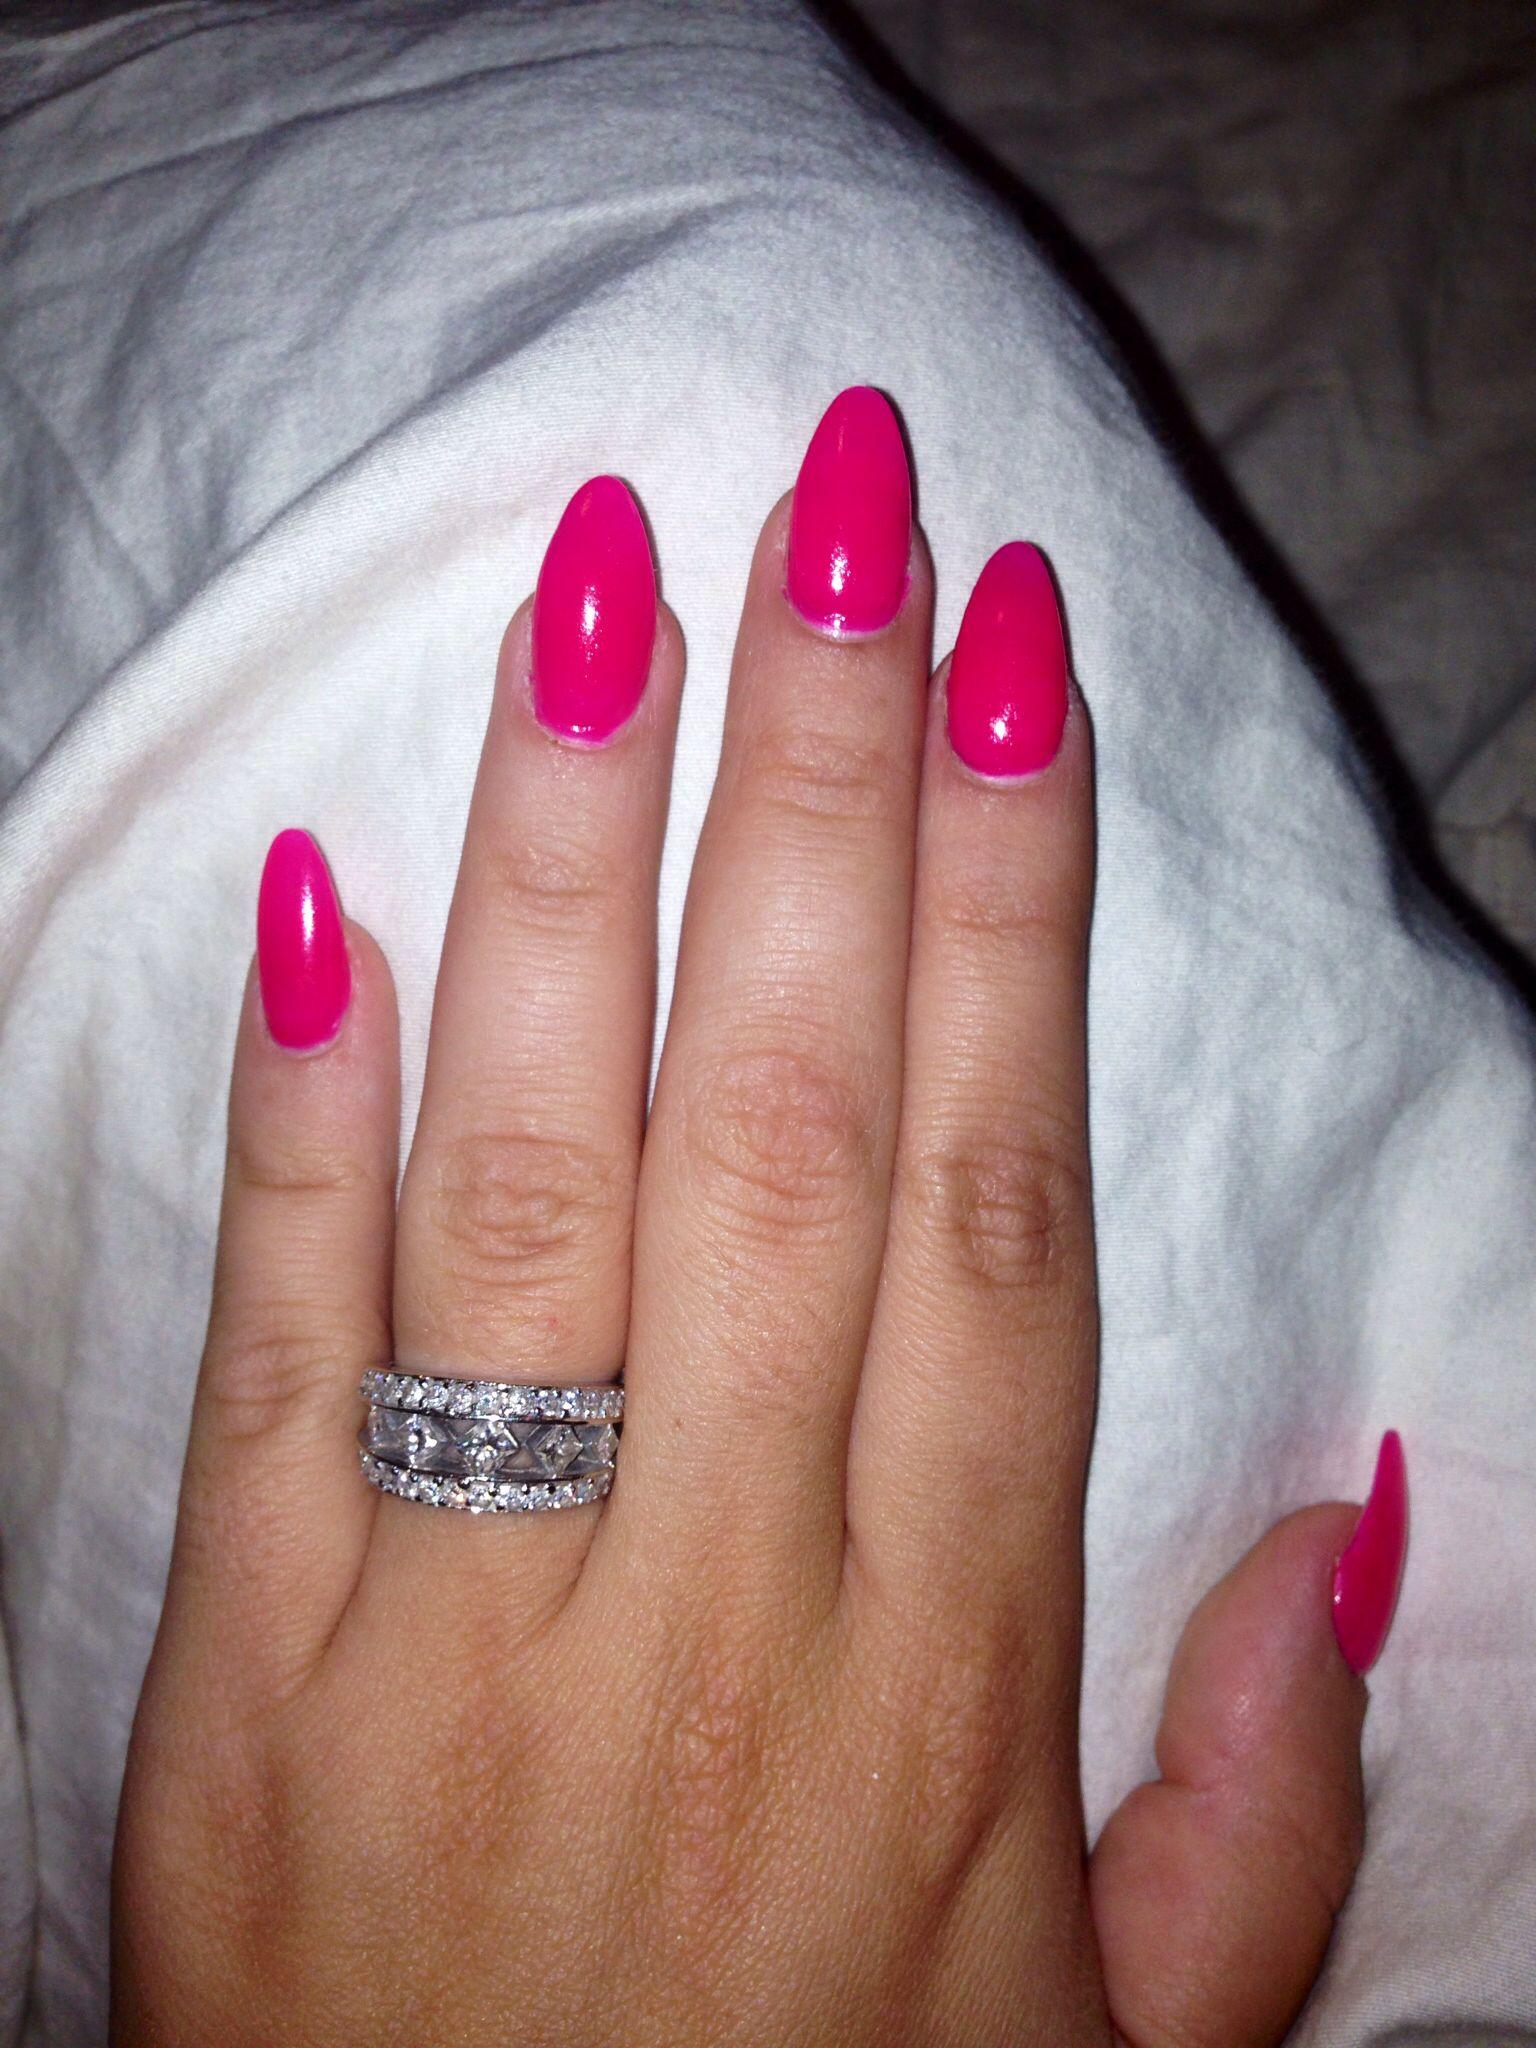 Hot pink stiletto nails | Nails | Pinterest | Double team, Almond ...